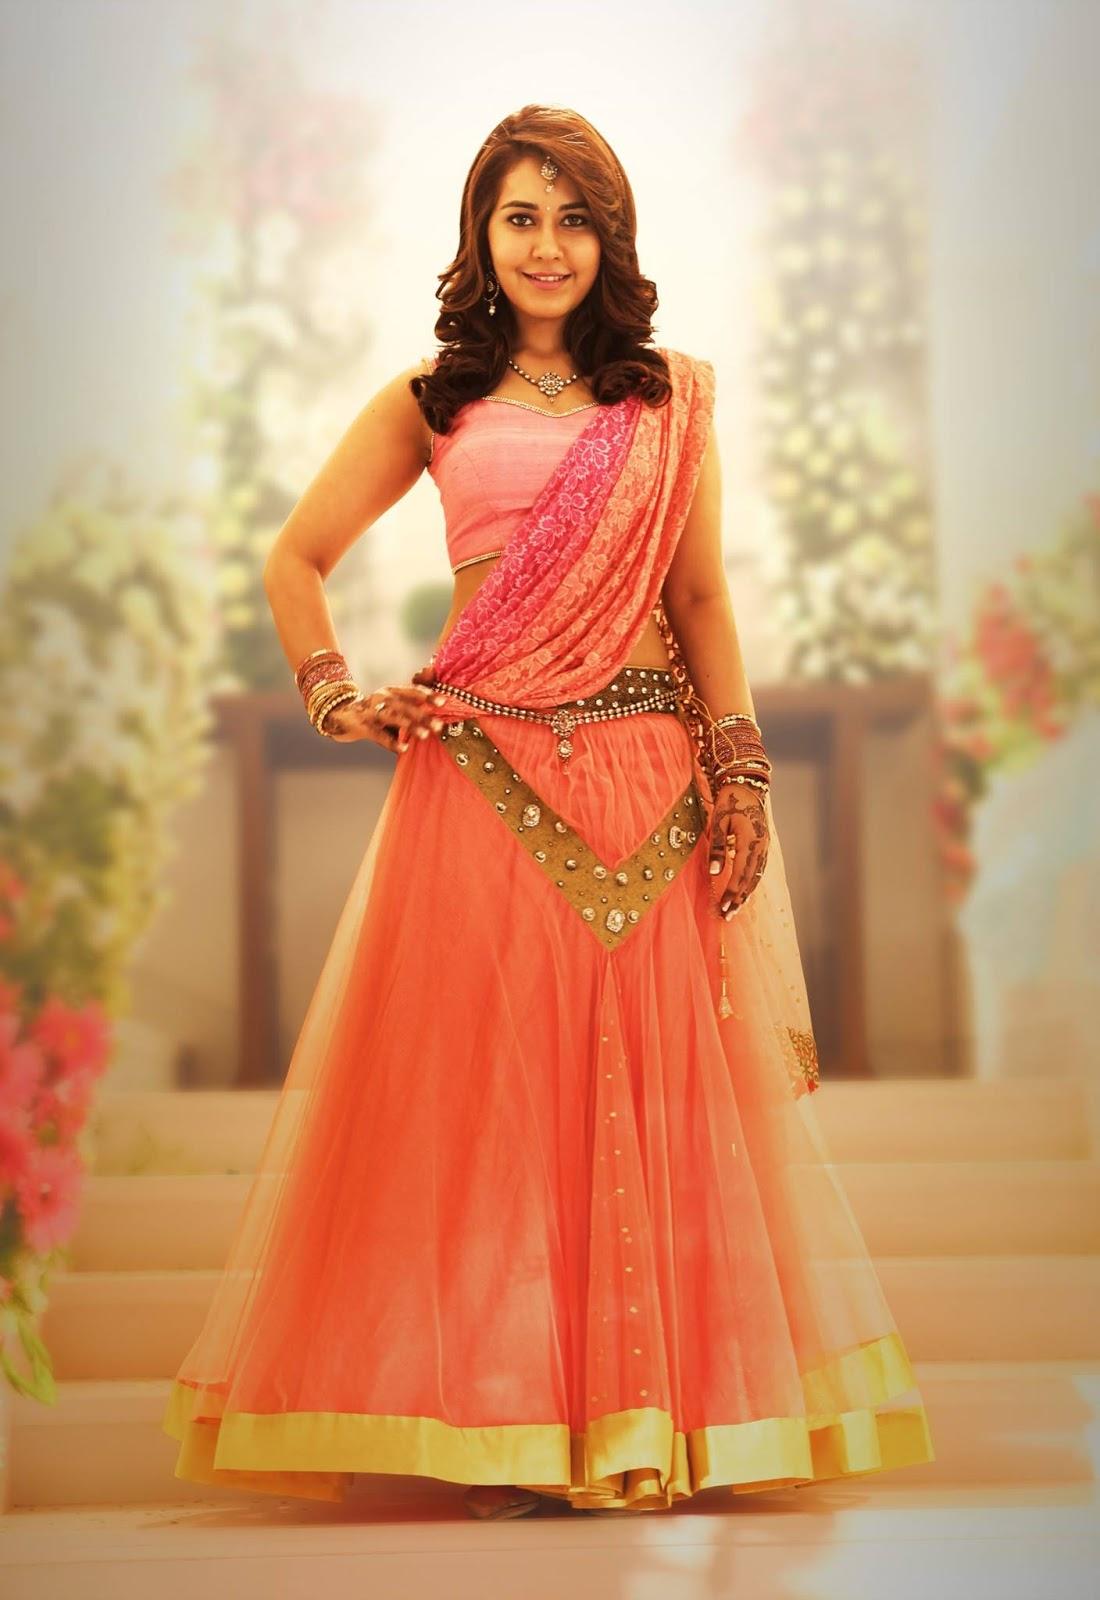 Rashi Khanna Hot Navel Stills In Orange Dress